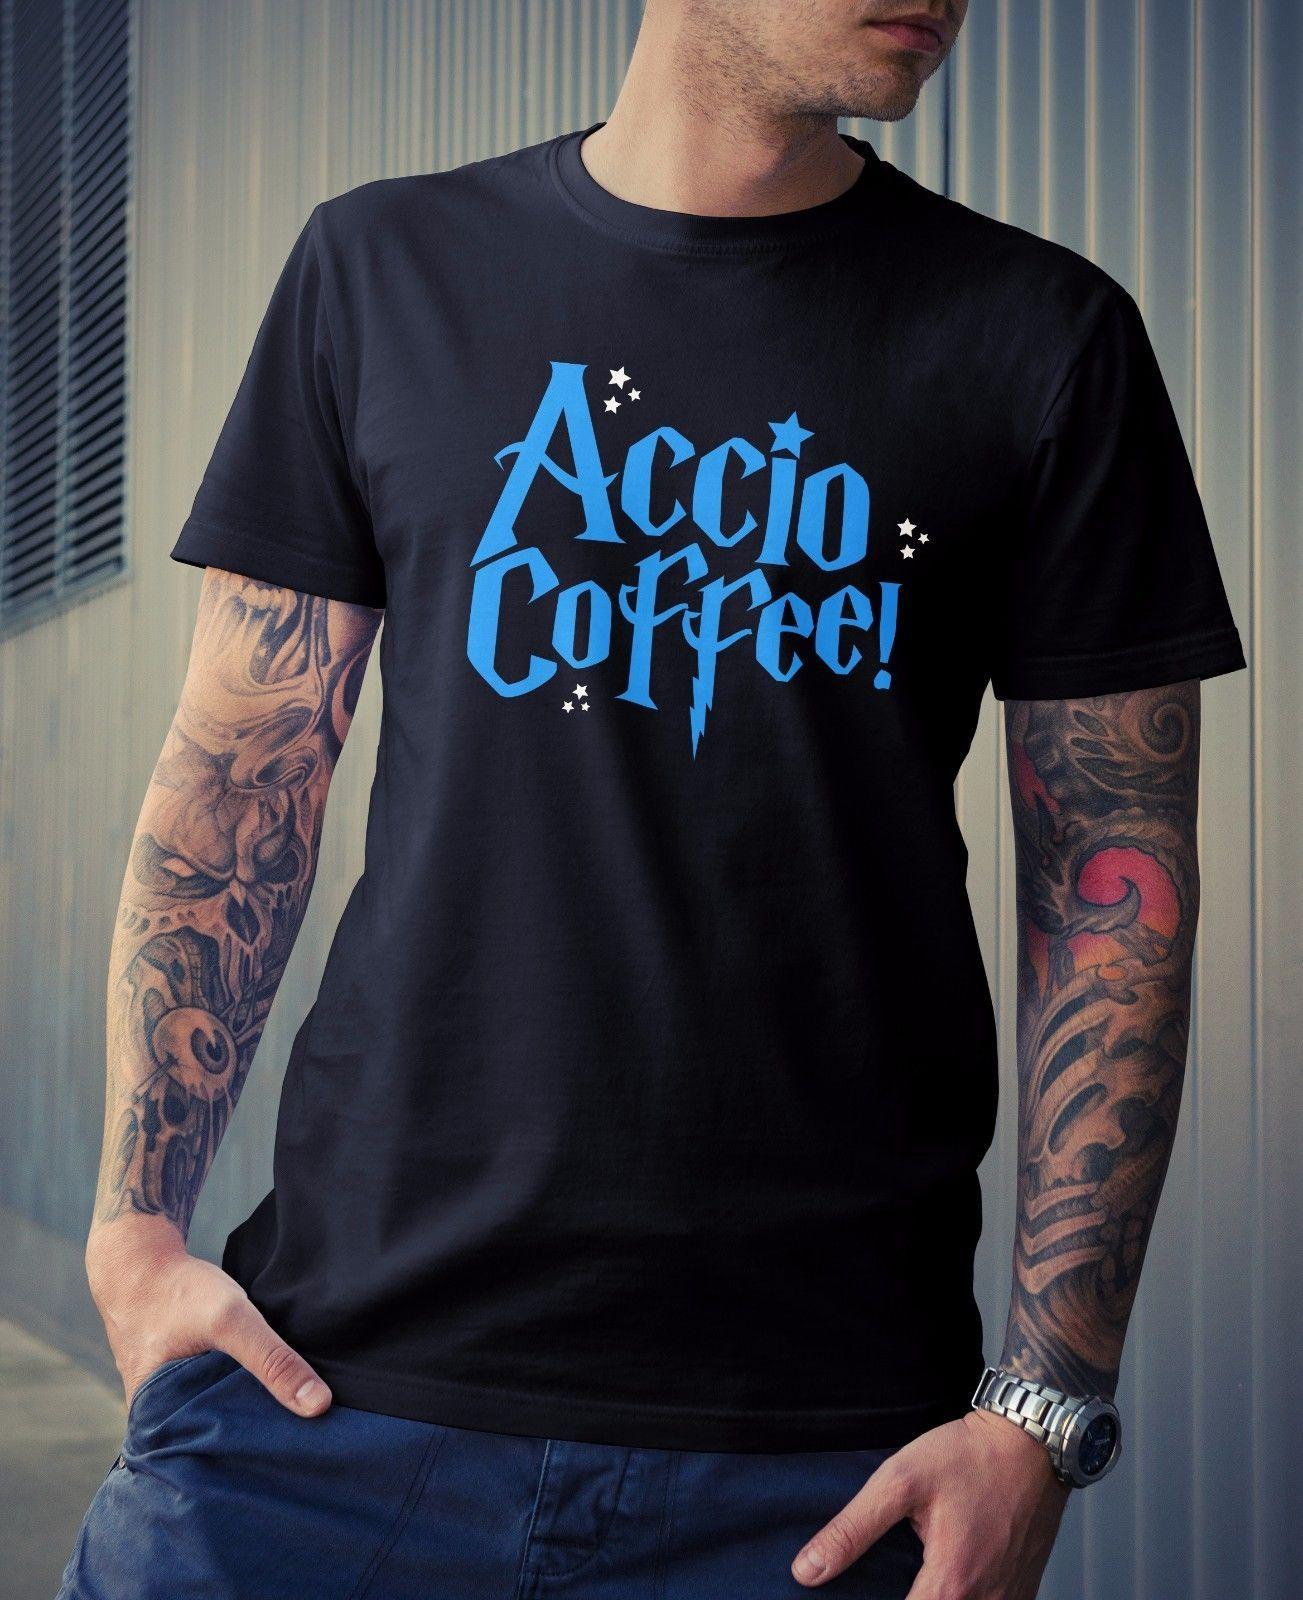 6733e3cf Mens Accio Coffee T Shirt Novelty Funny Joke Harry Potter Wizard Geek Nerd  Dad Cool Casual Pride T Shirt Men Unisex Fashion Tshirt Free On T Shirts It  Tee ...